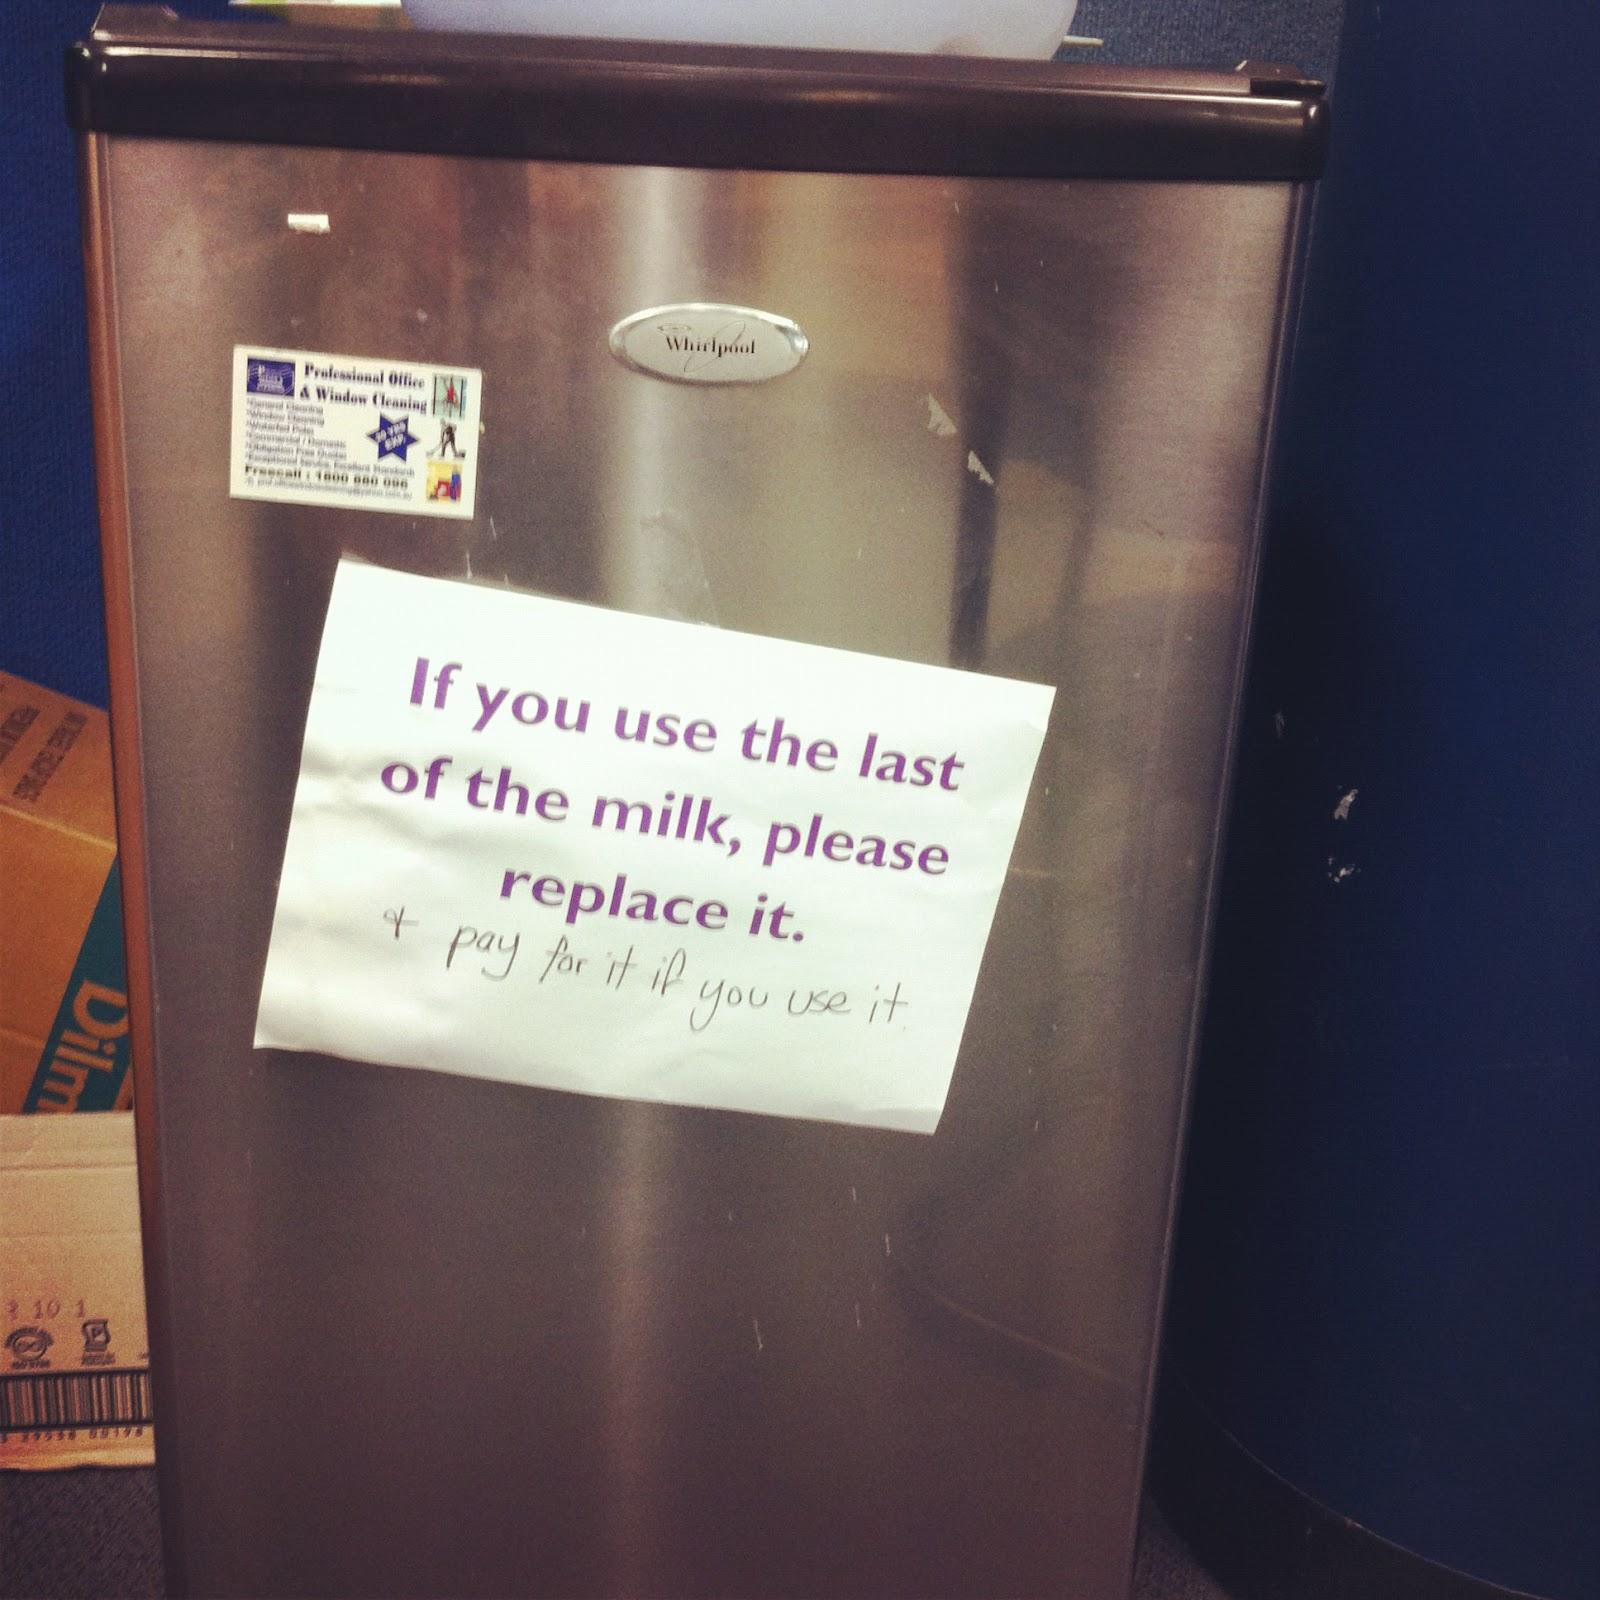 Kitchen Courtesy Signs: Office Kitchen Politics